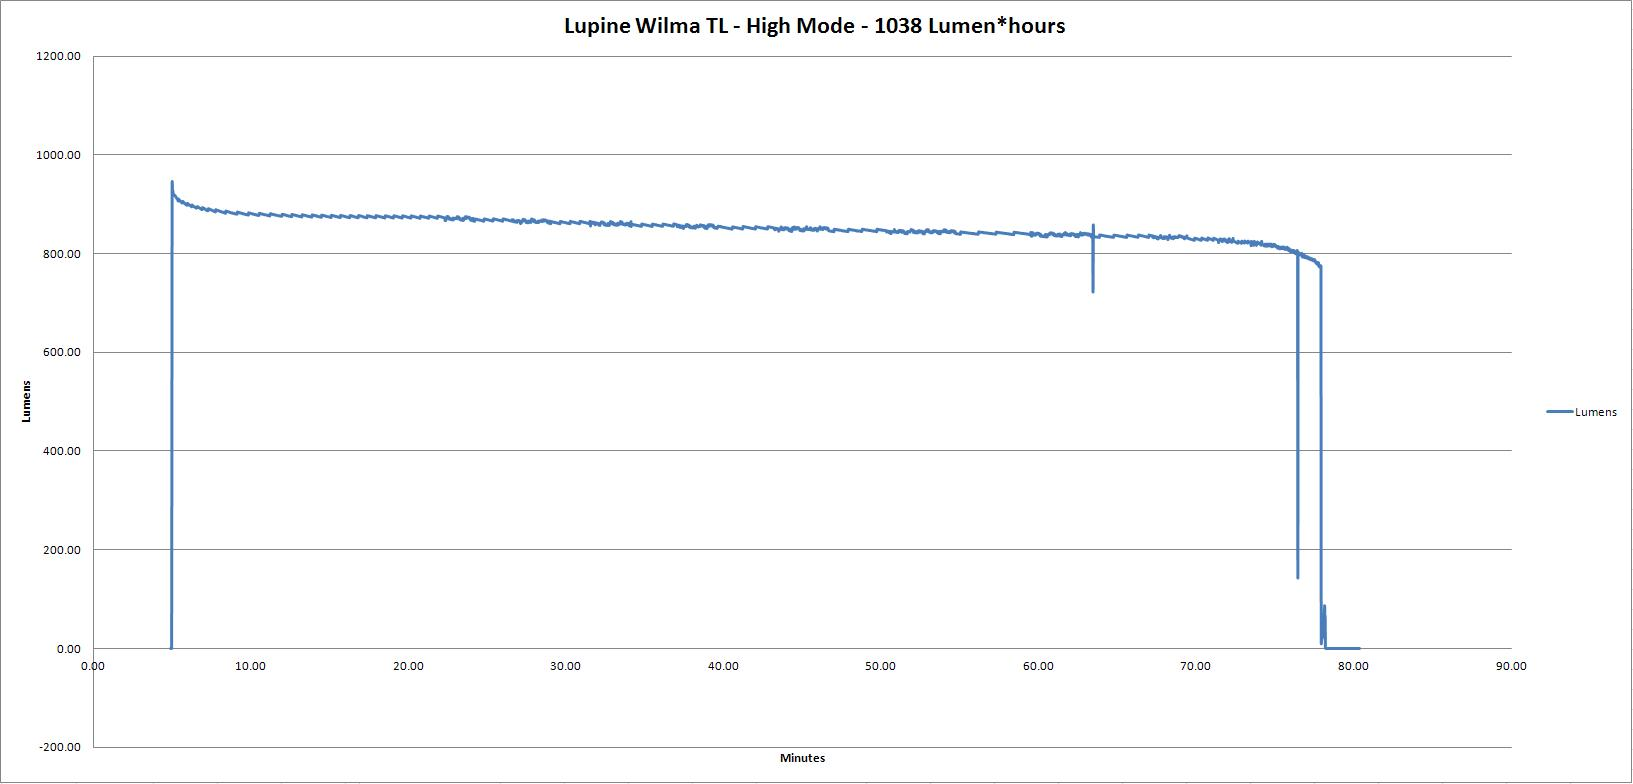 Lupine-wilma-TL-high-0